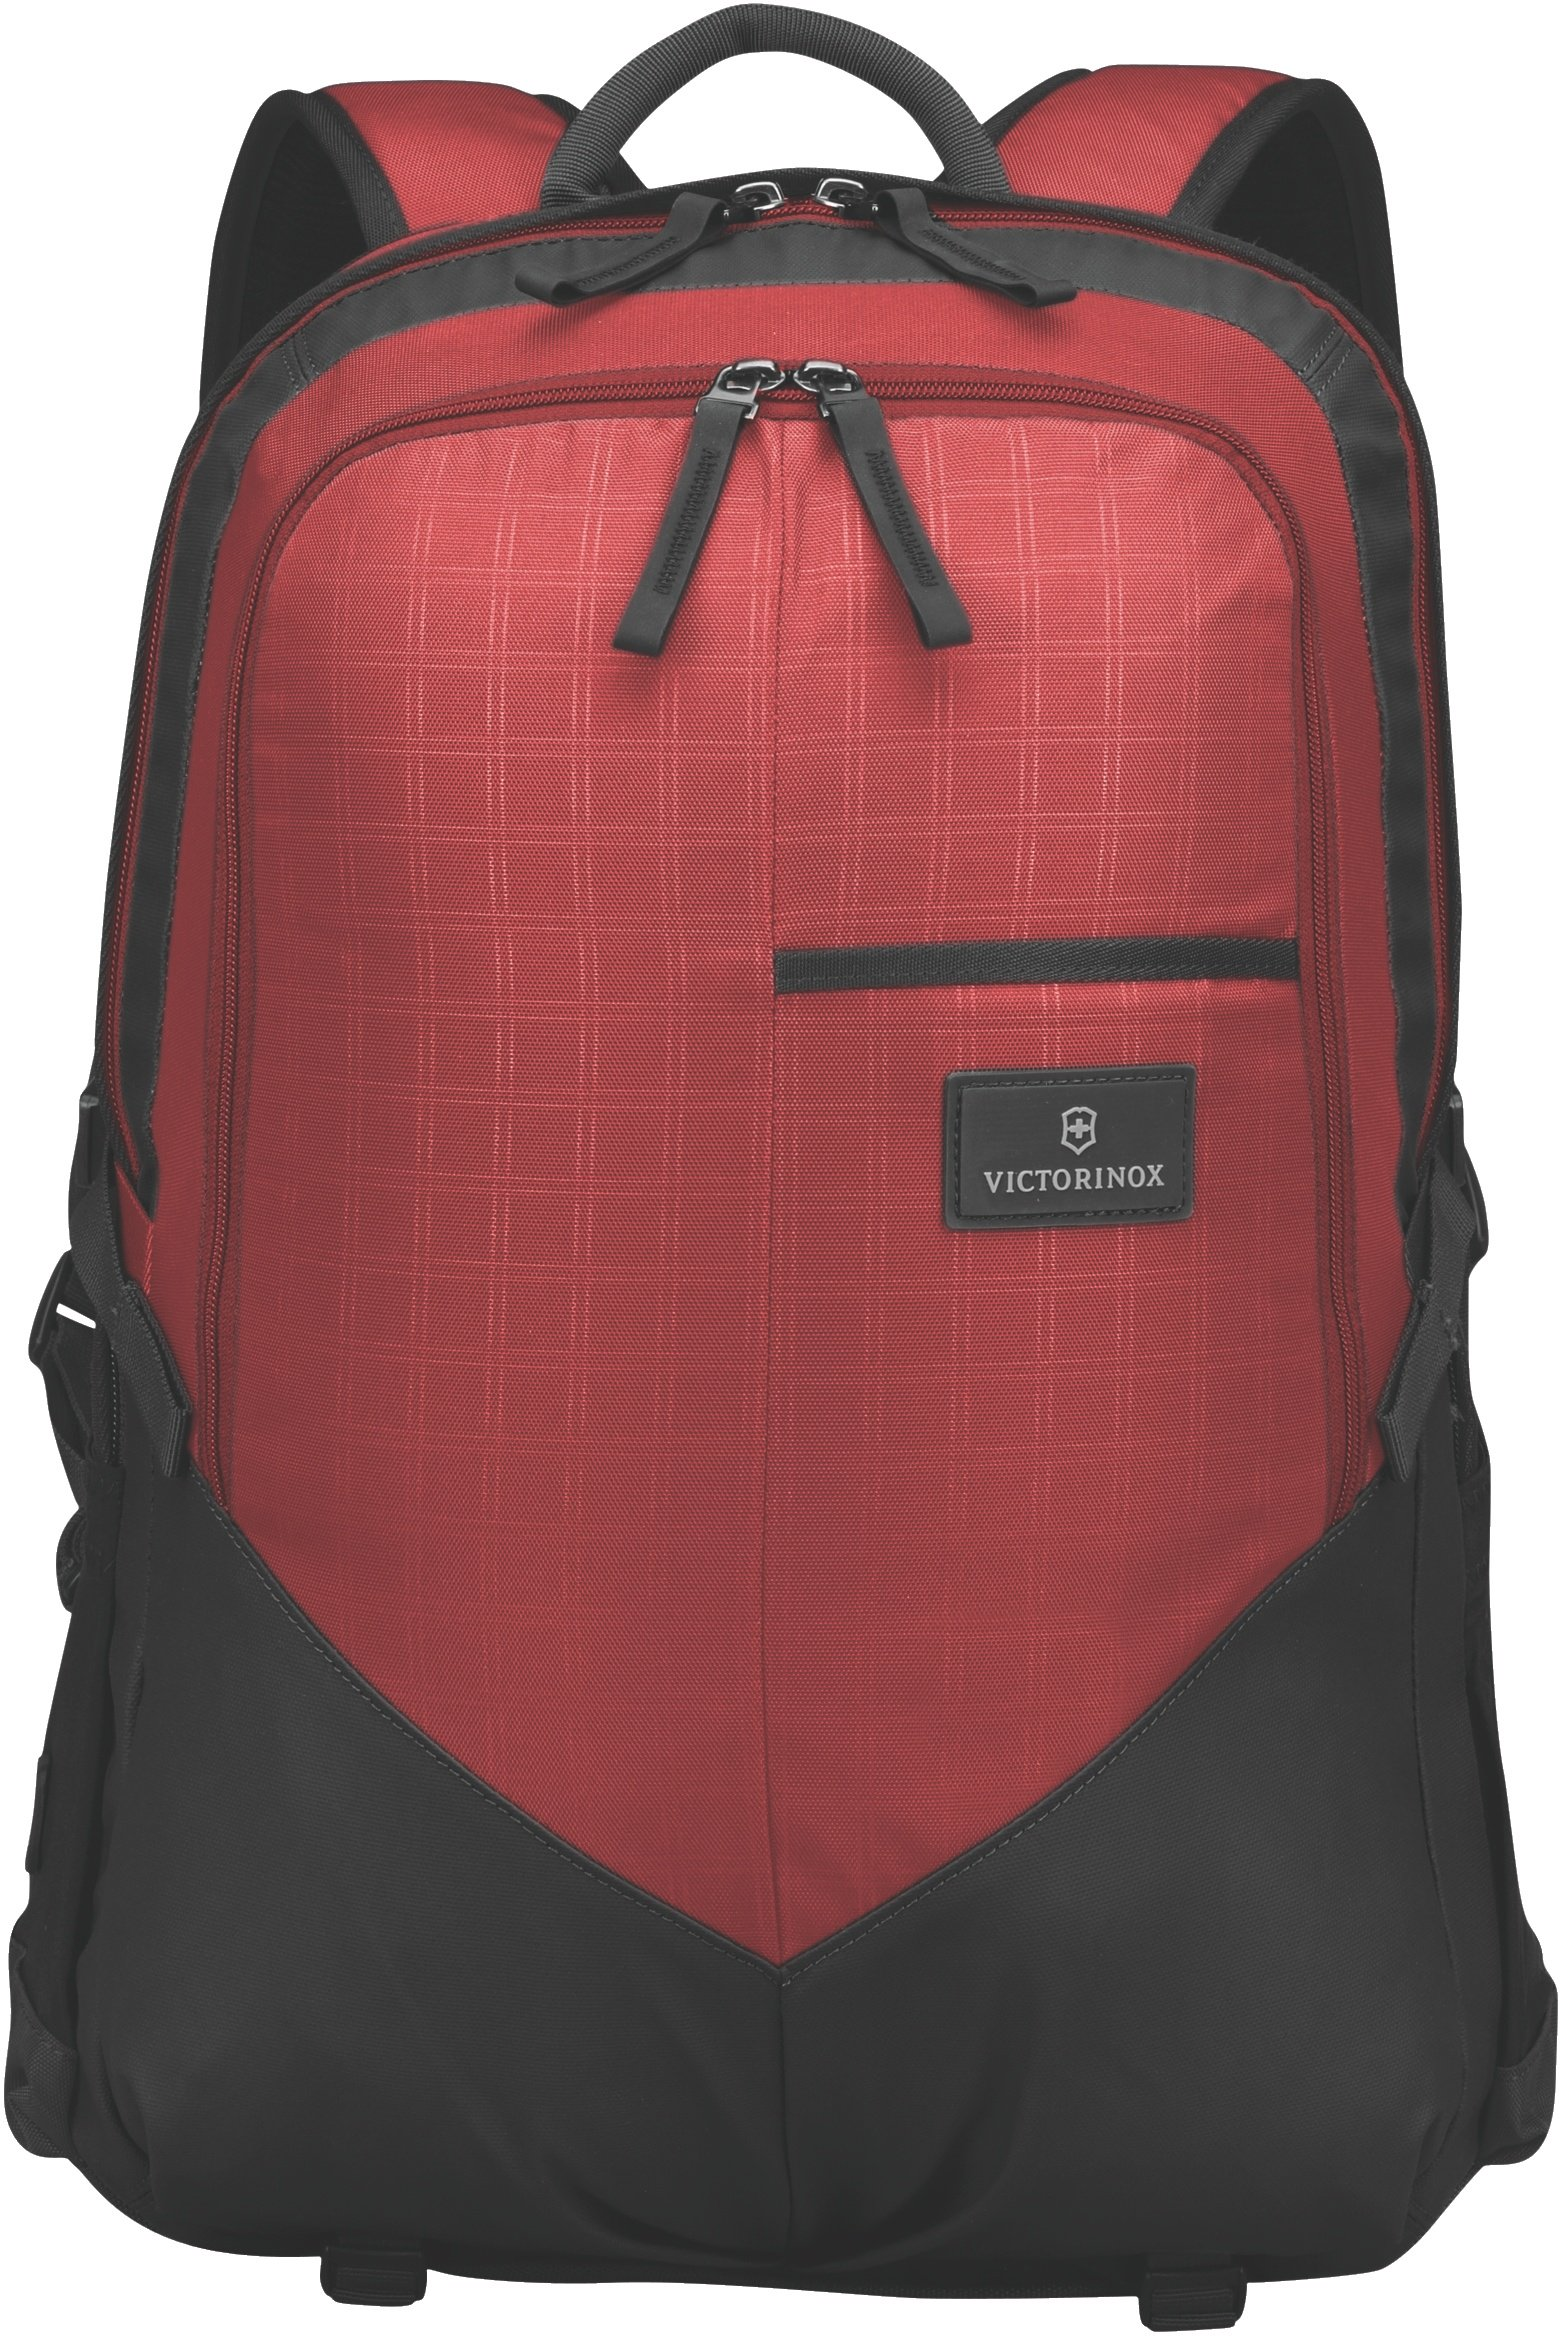 Victorinox Altmont 3.0 Deluxe Laptop Backpack, Red/Black